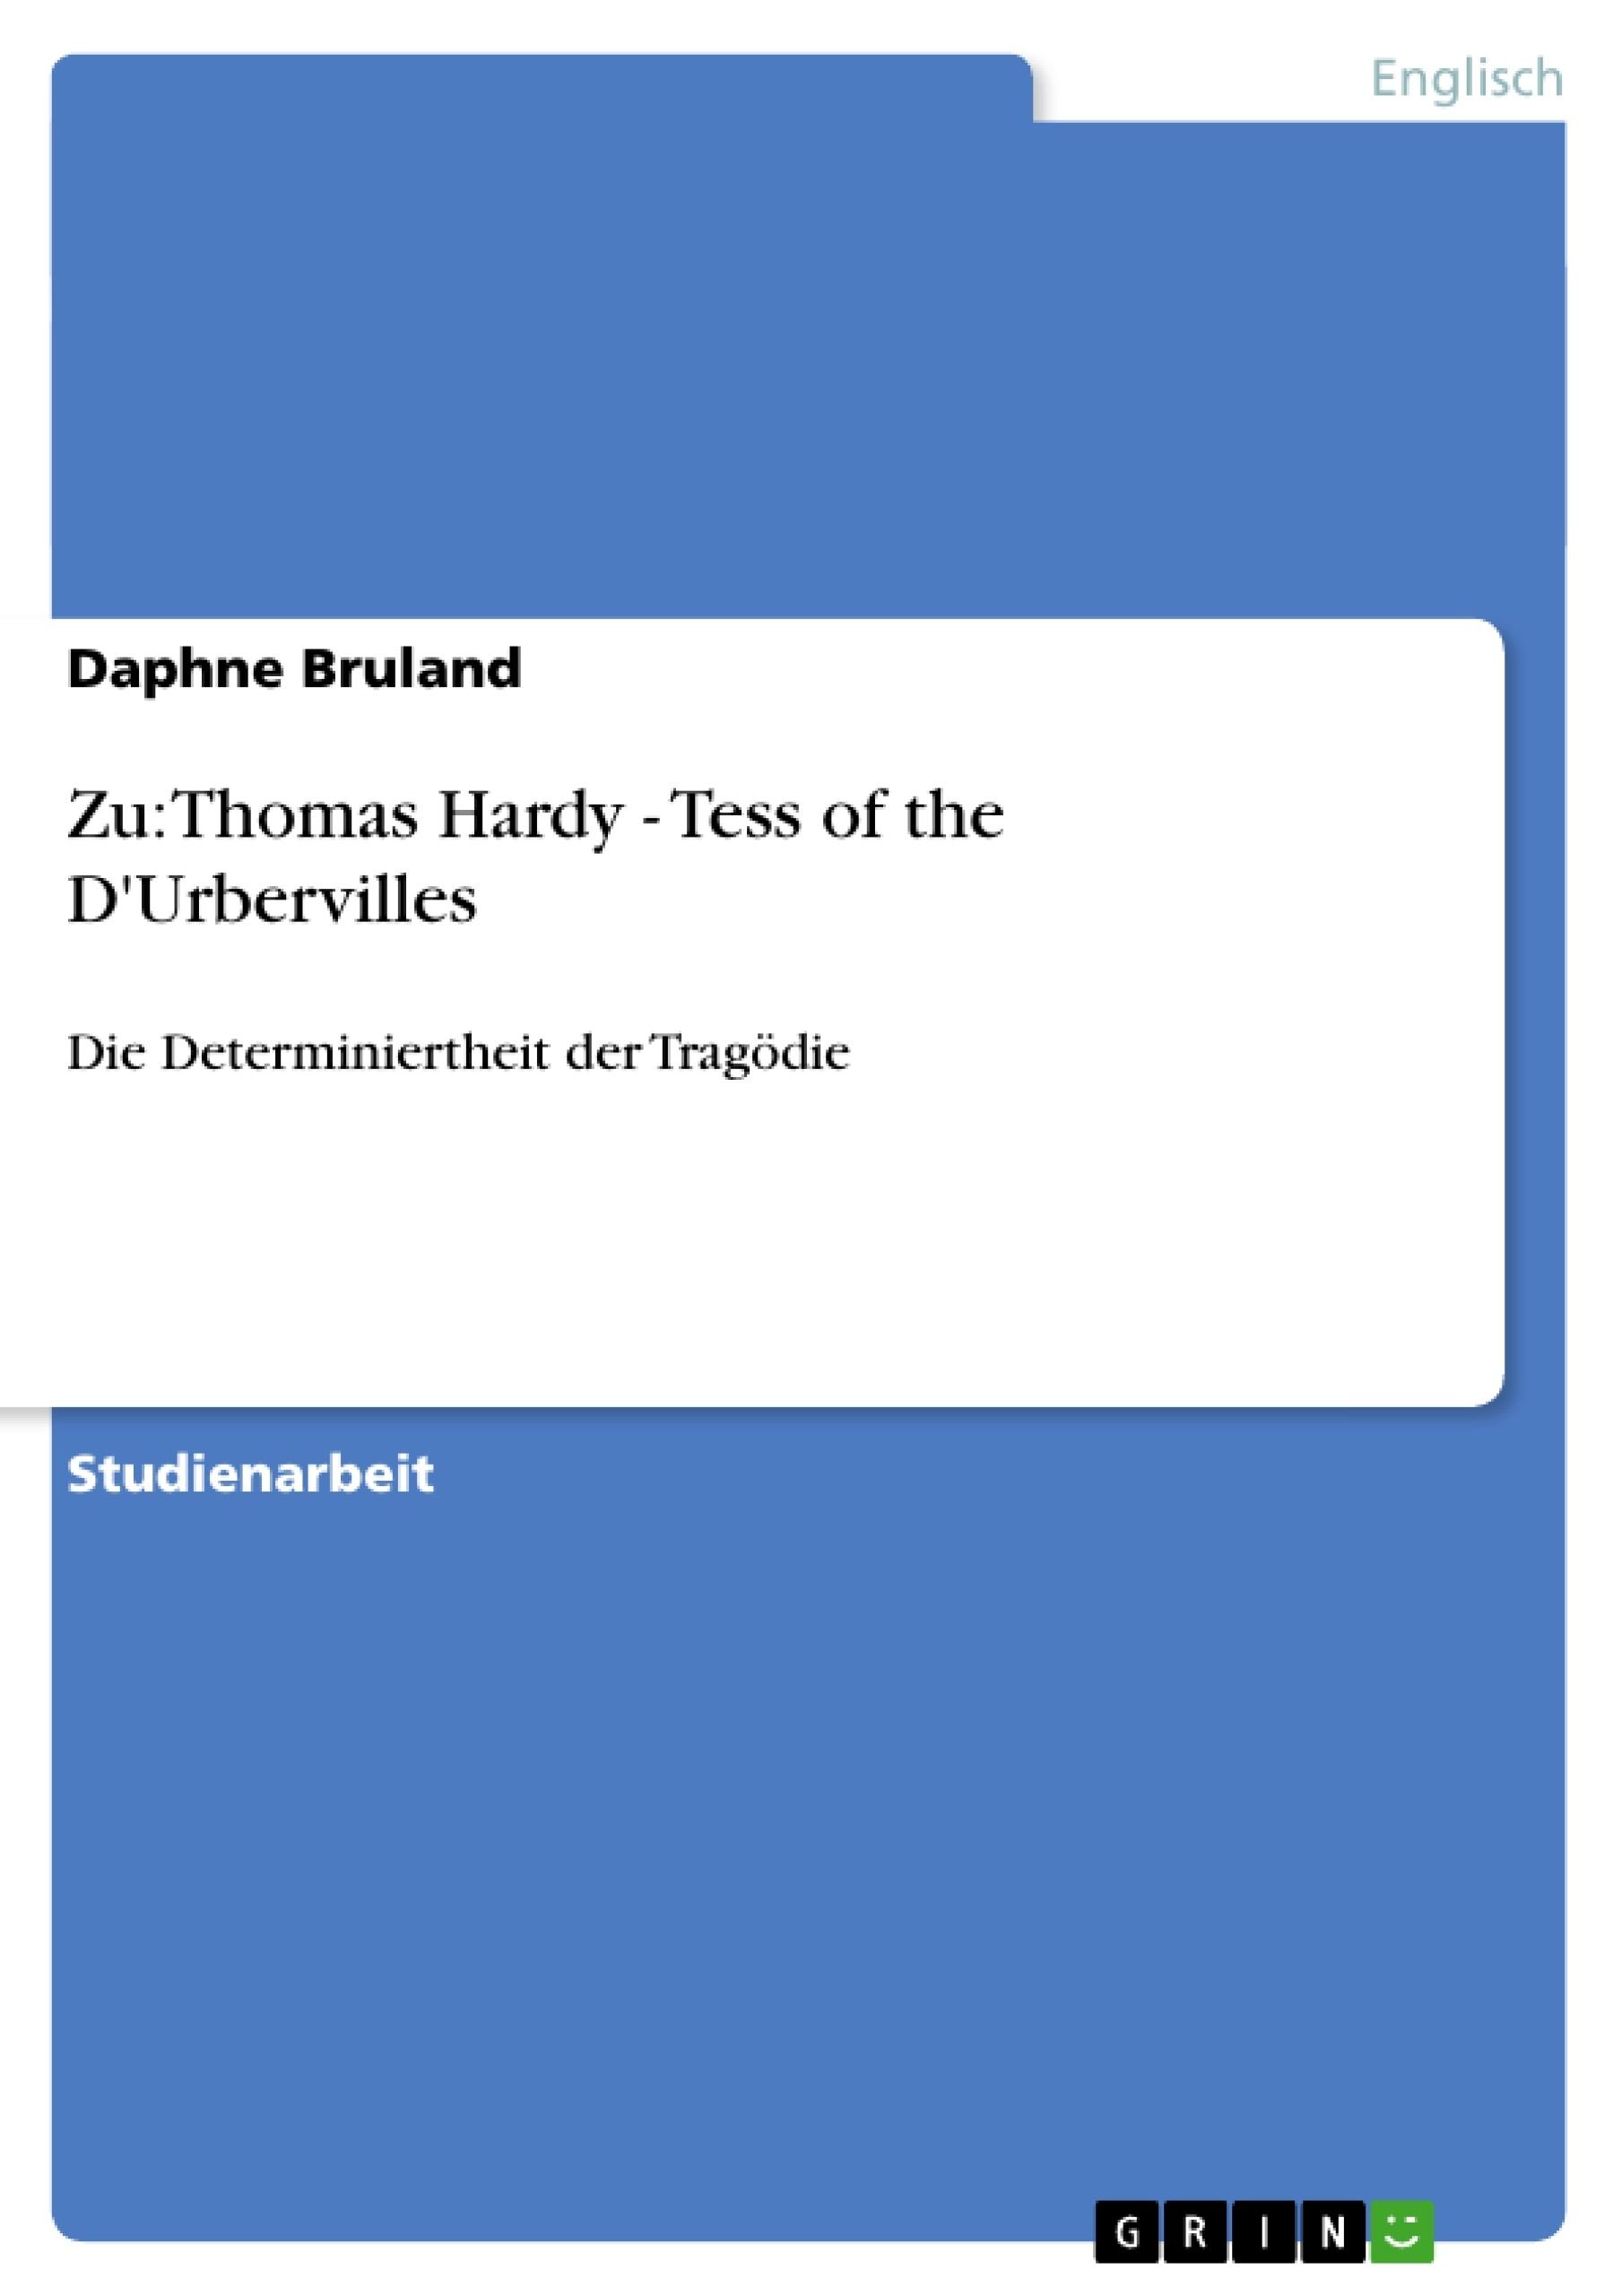 Titel: Zu: Thomas Hardy - Tess of the D'Urbervilles